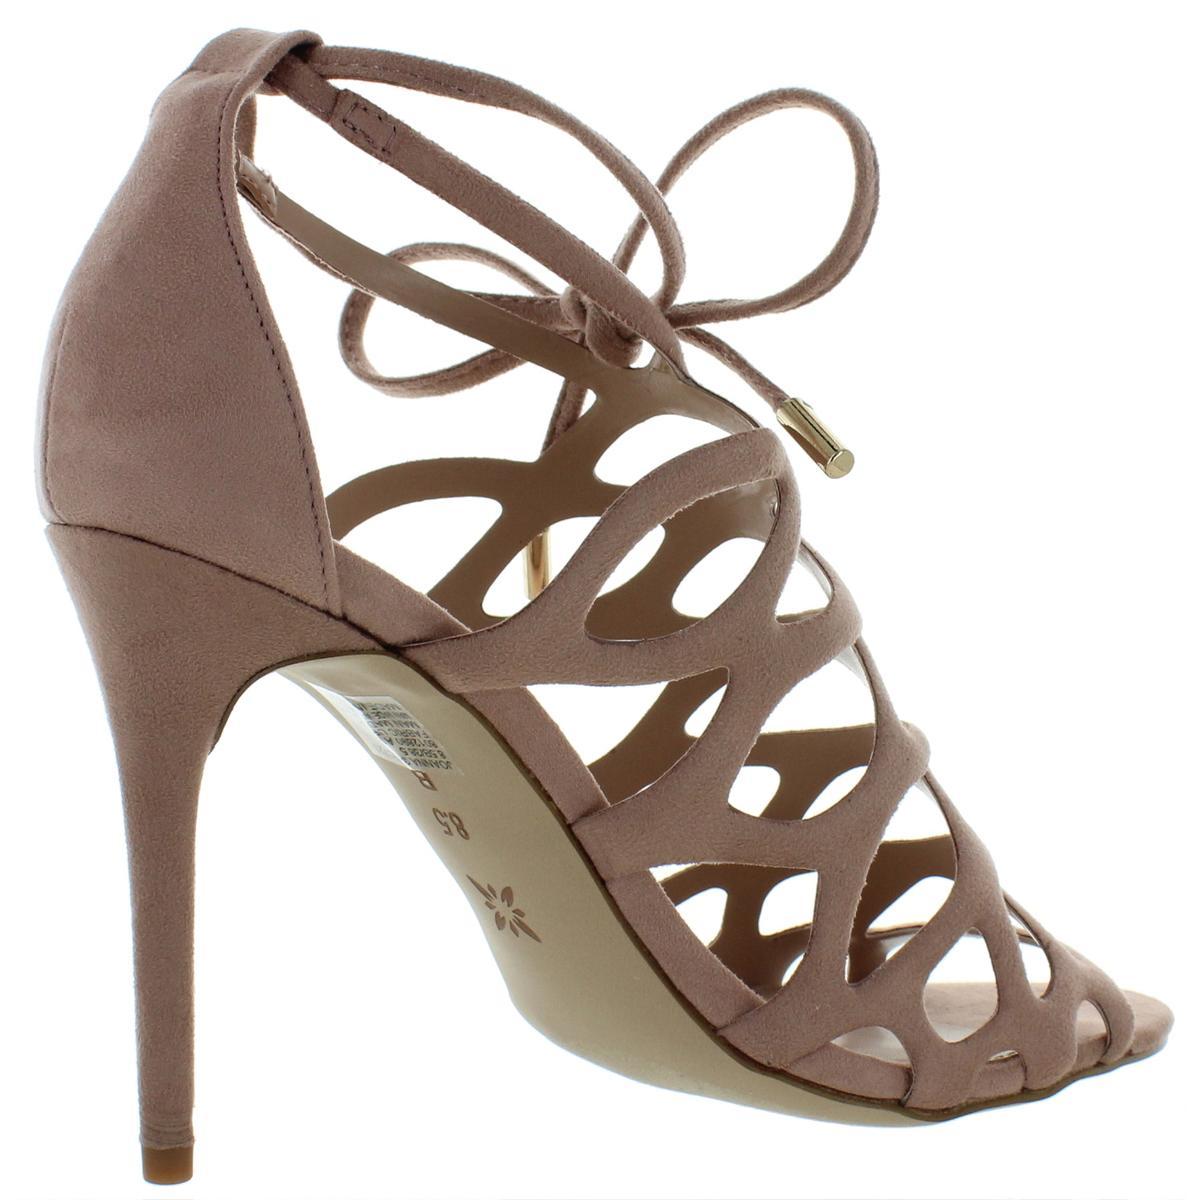 BCBGeneration-Womens-Joanna-Metallic-Caged-Dress-Sandals-Shoes-BHFO-8380 thumbnail 6